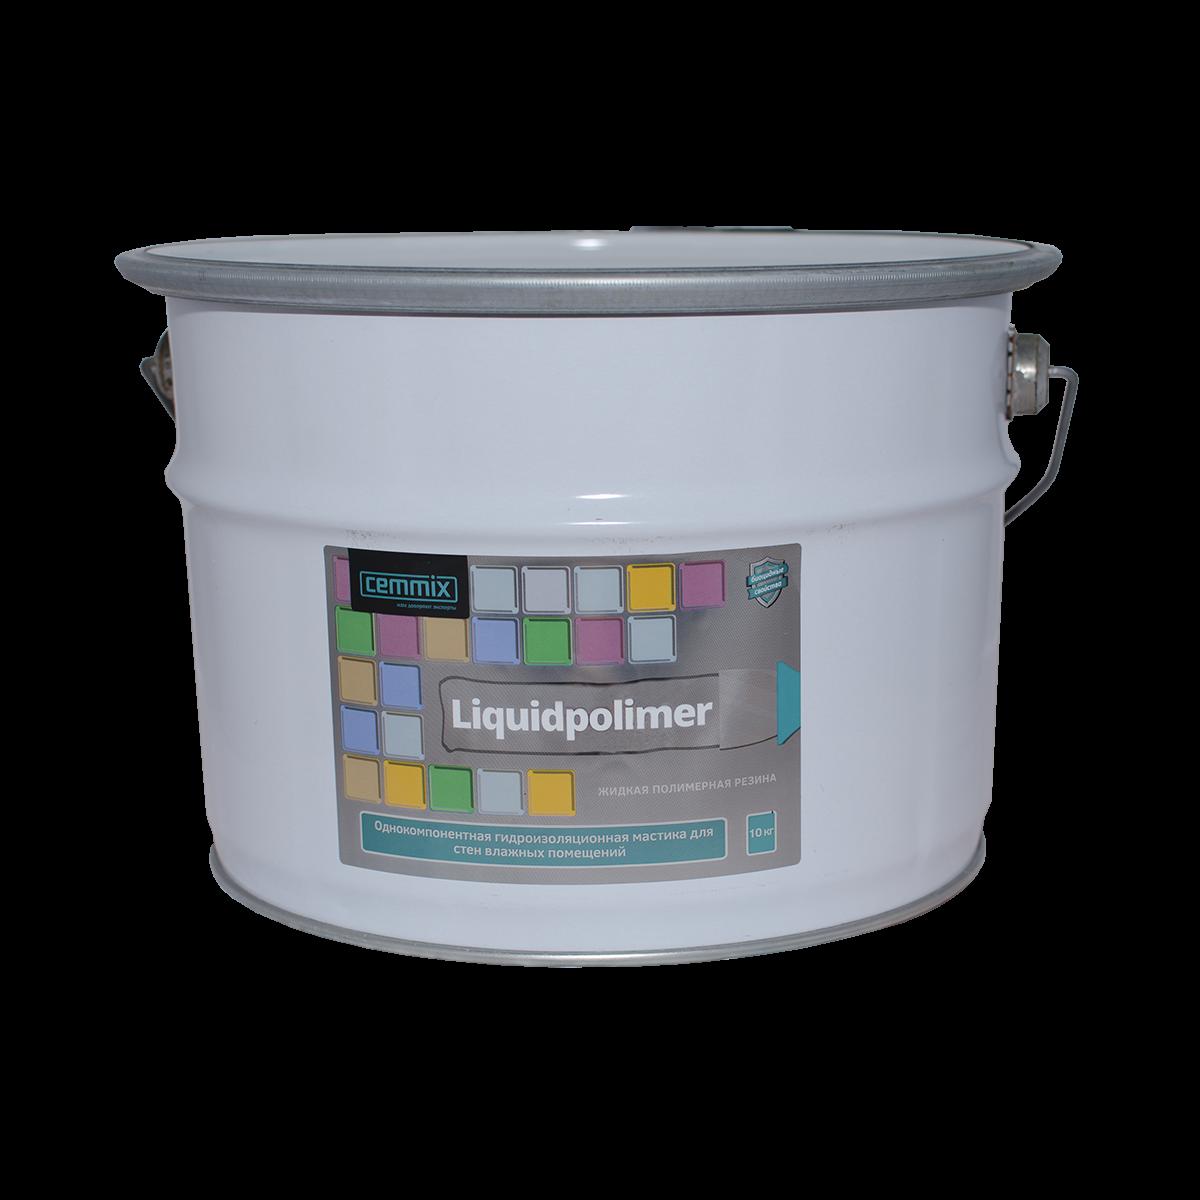 Liquidpolimer